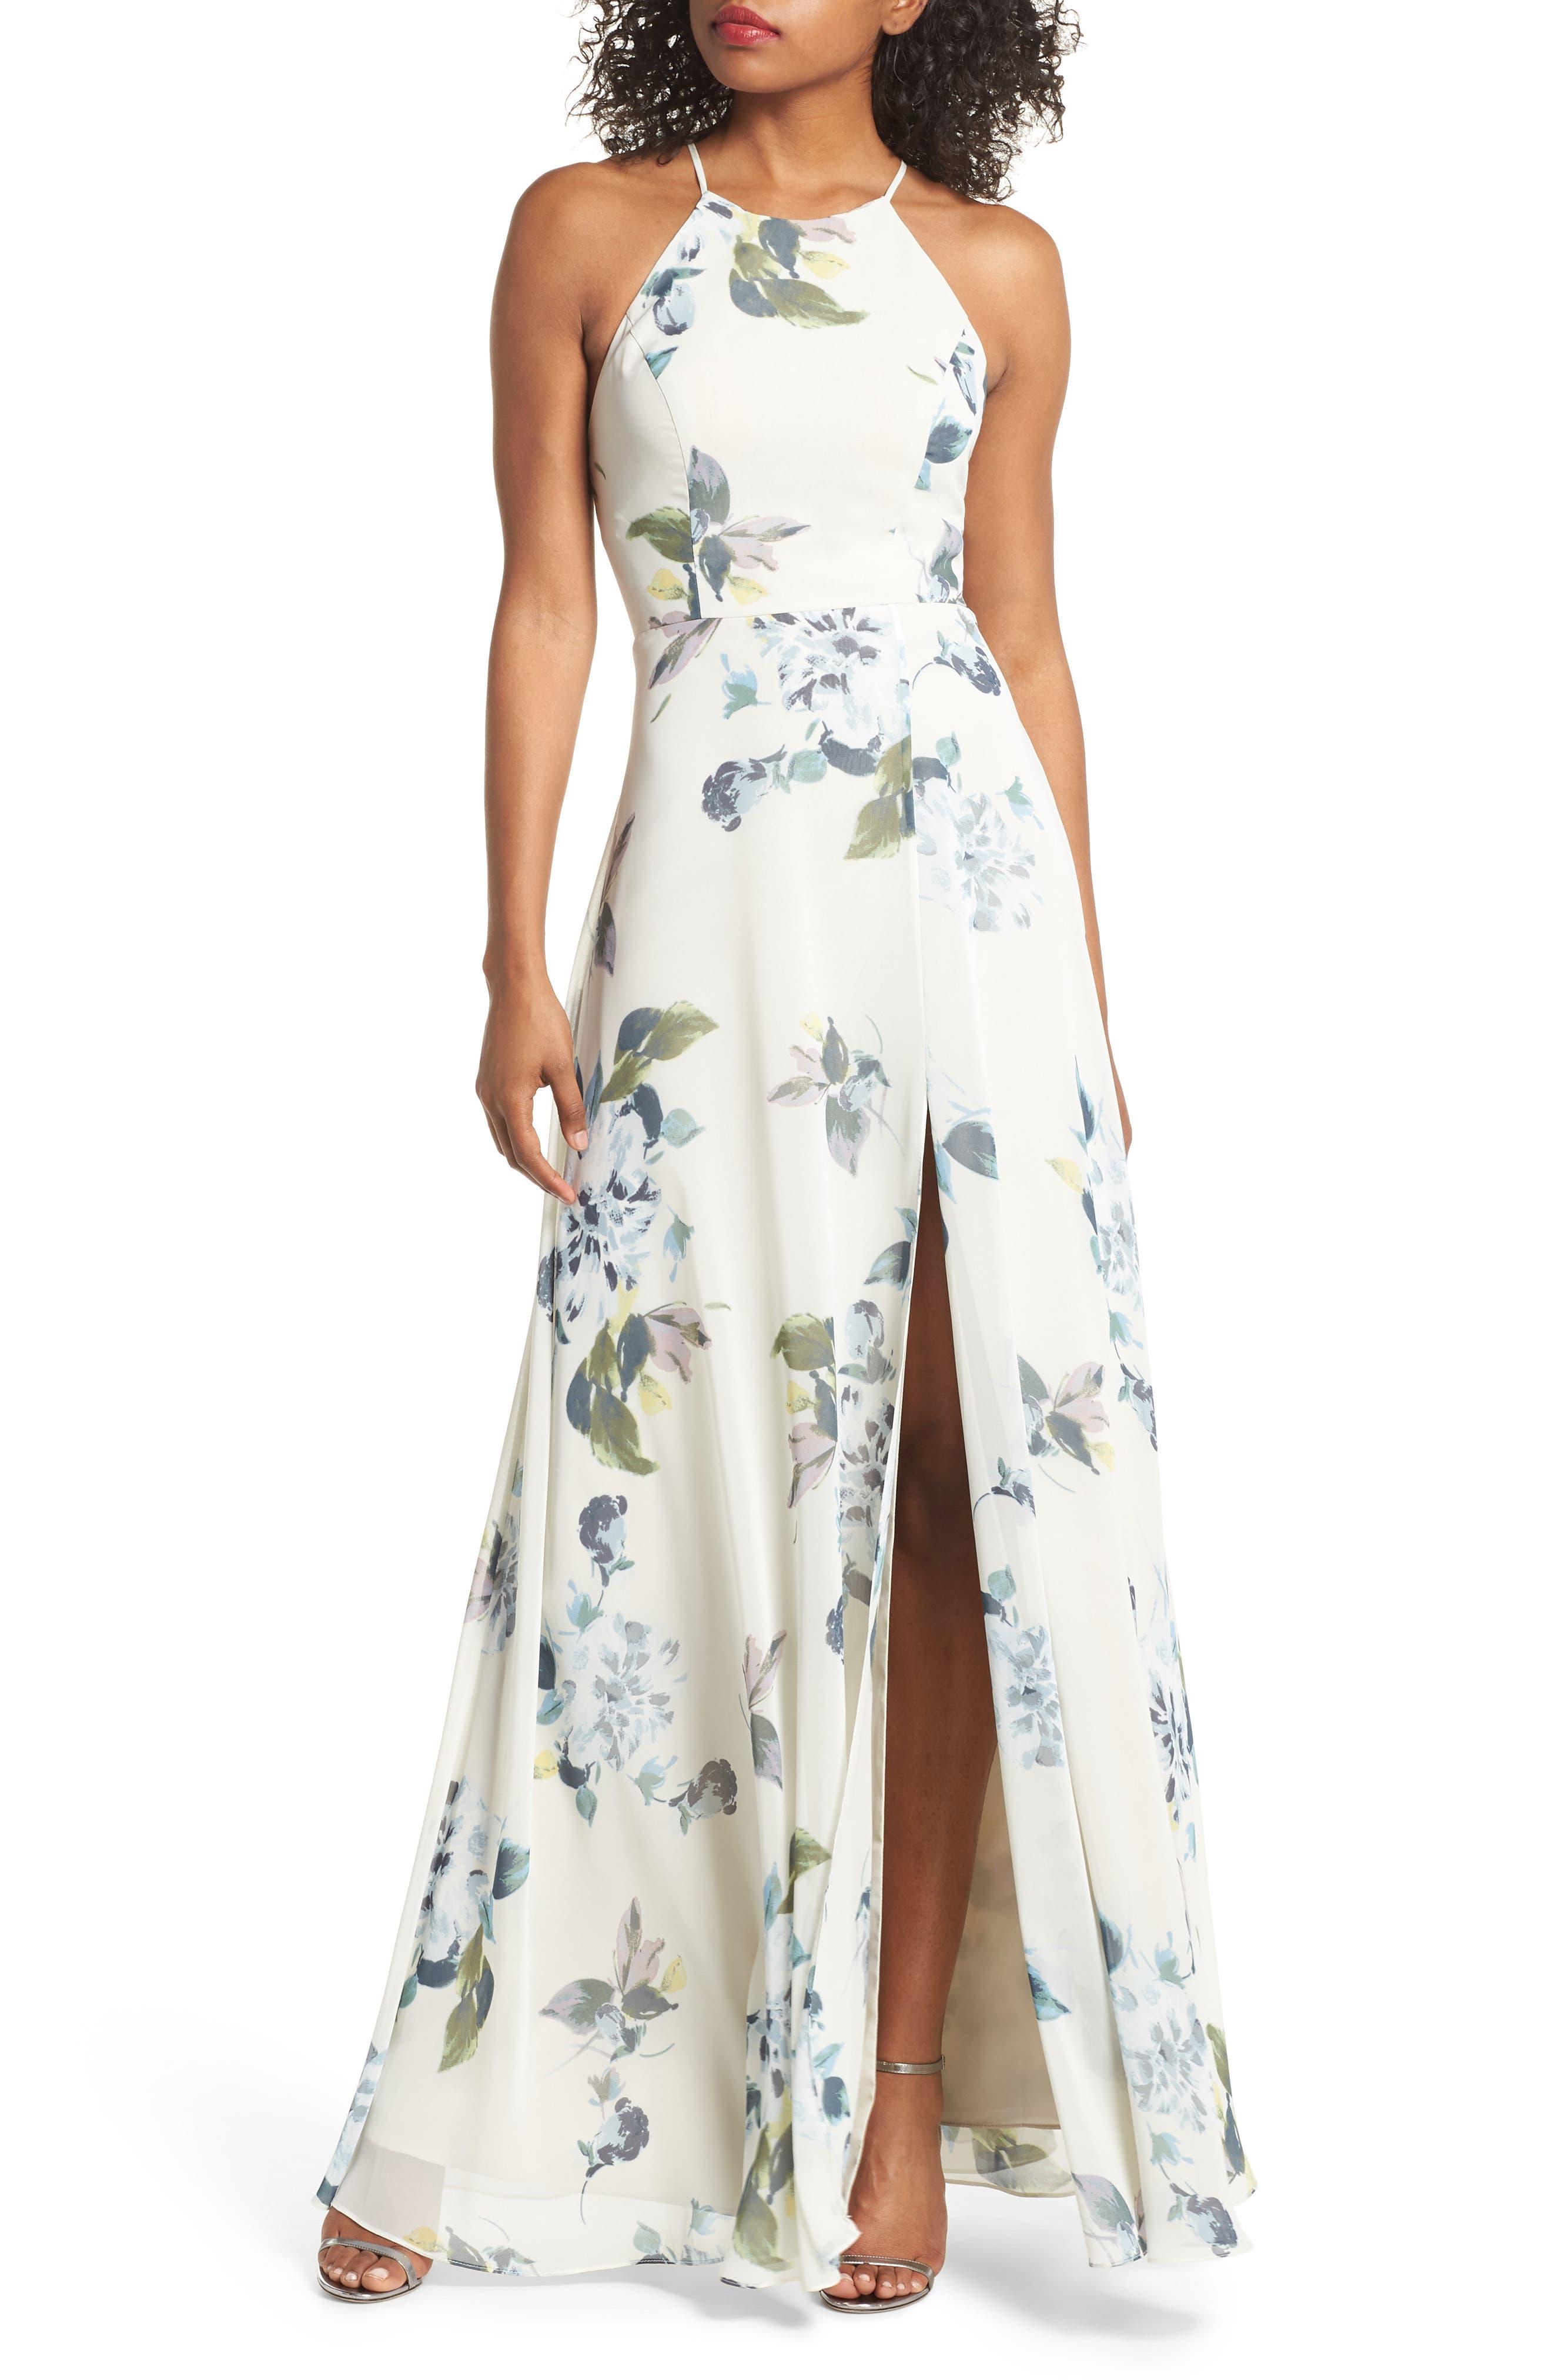 JENNY YOO Collection Kayla Ohana Print Gown in Soft Sage Blue Multi